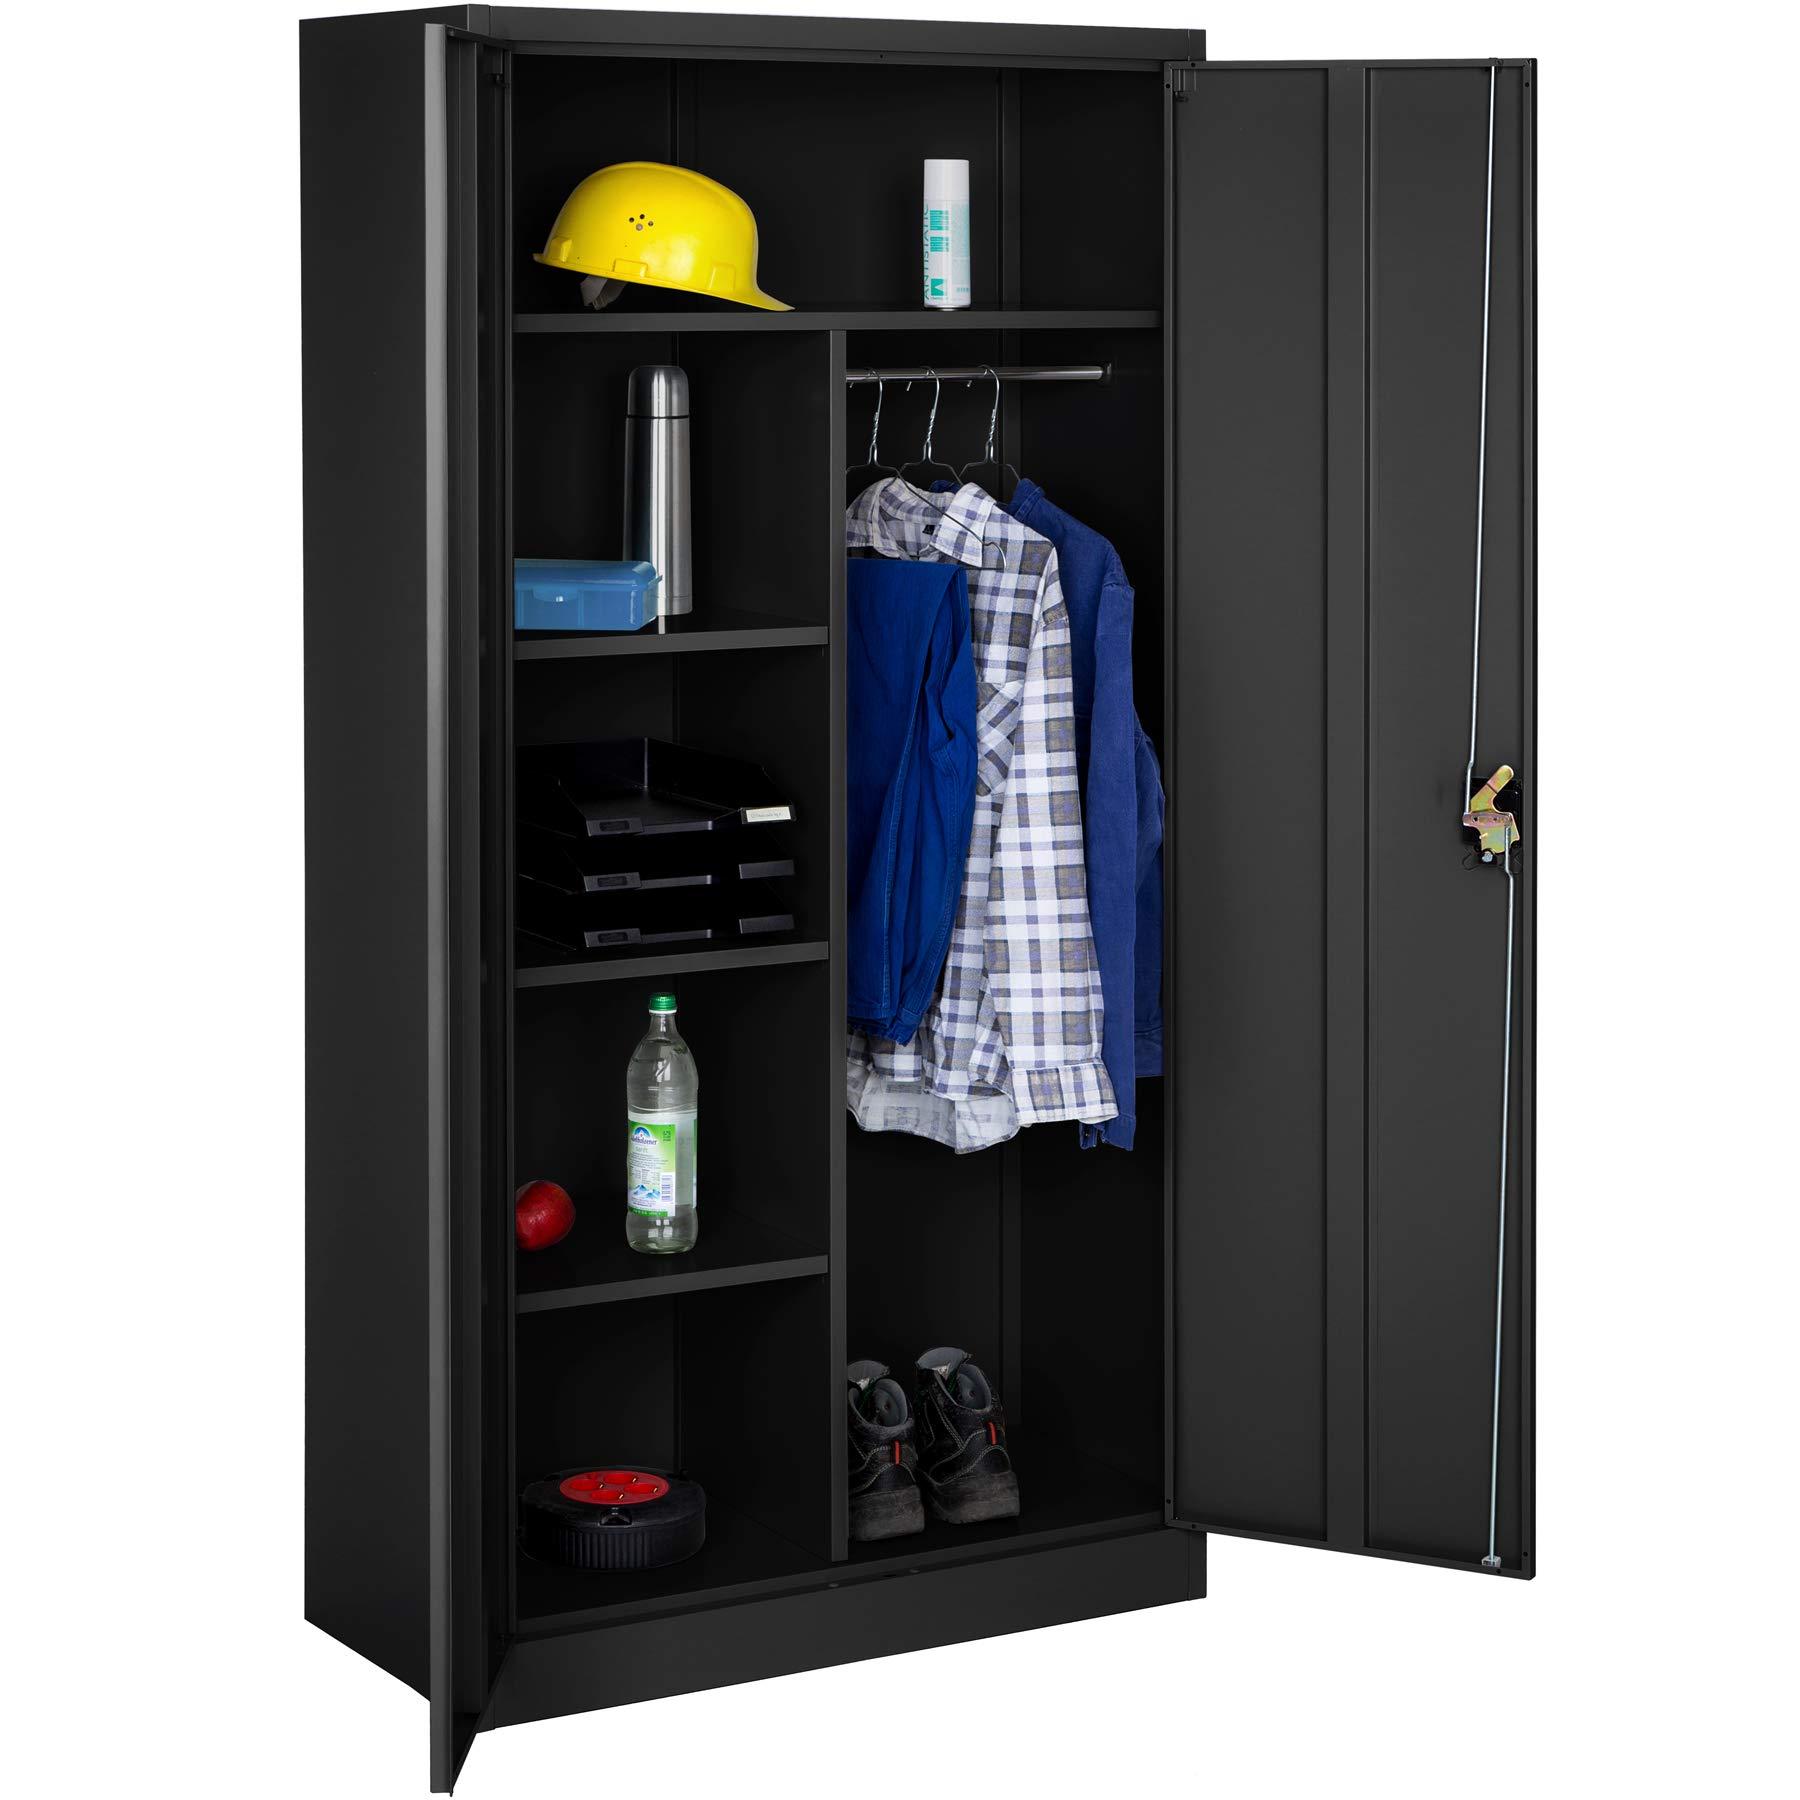 tectake 402940 armoire de bureau metallique noir 2 porte verrouillable 180x90x40cm style. Black Bedroom Furniture Sets. Home Design Ideas